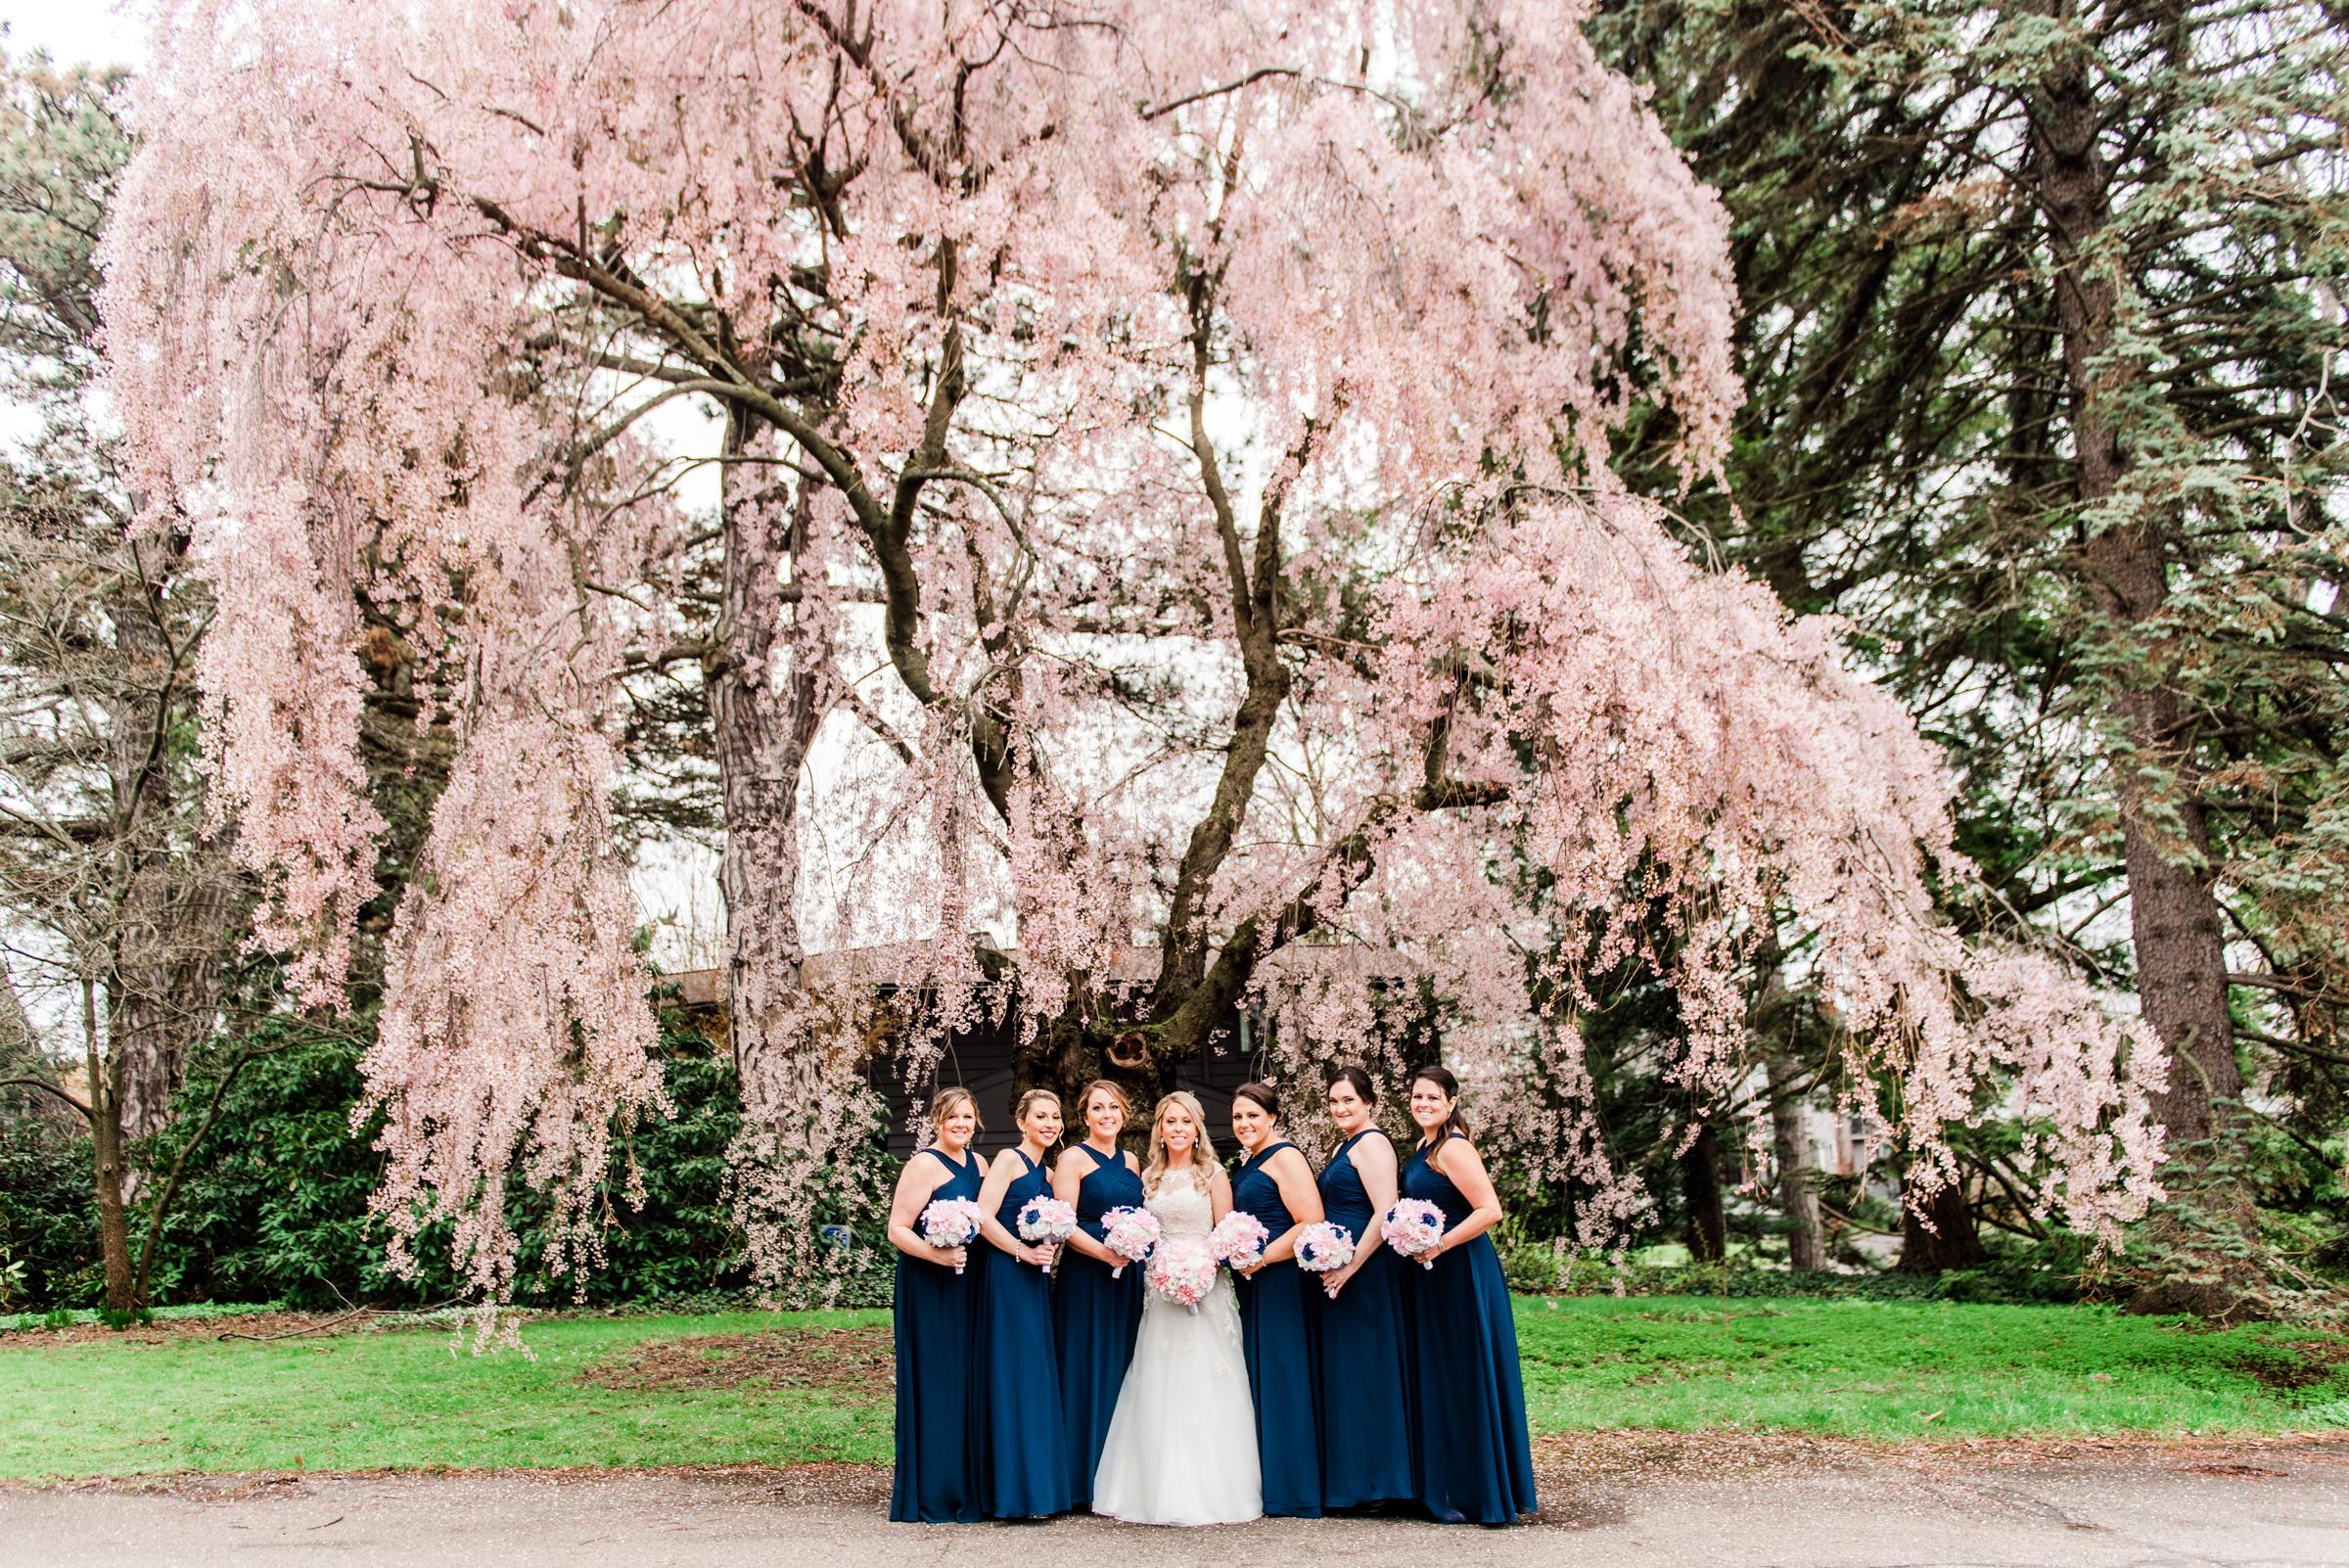 Double_Tree_by_Hilton_Rochester_Wedding_JILL_STUDIO_Rochester_NY_Photographer_DSC_3855.jpg